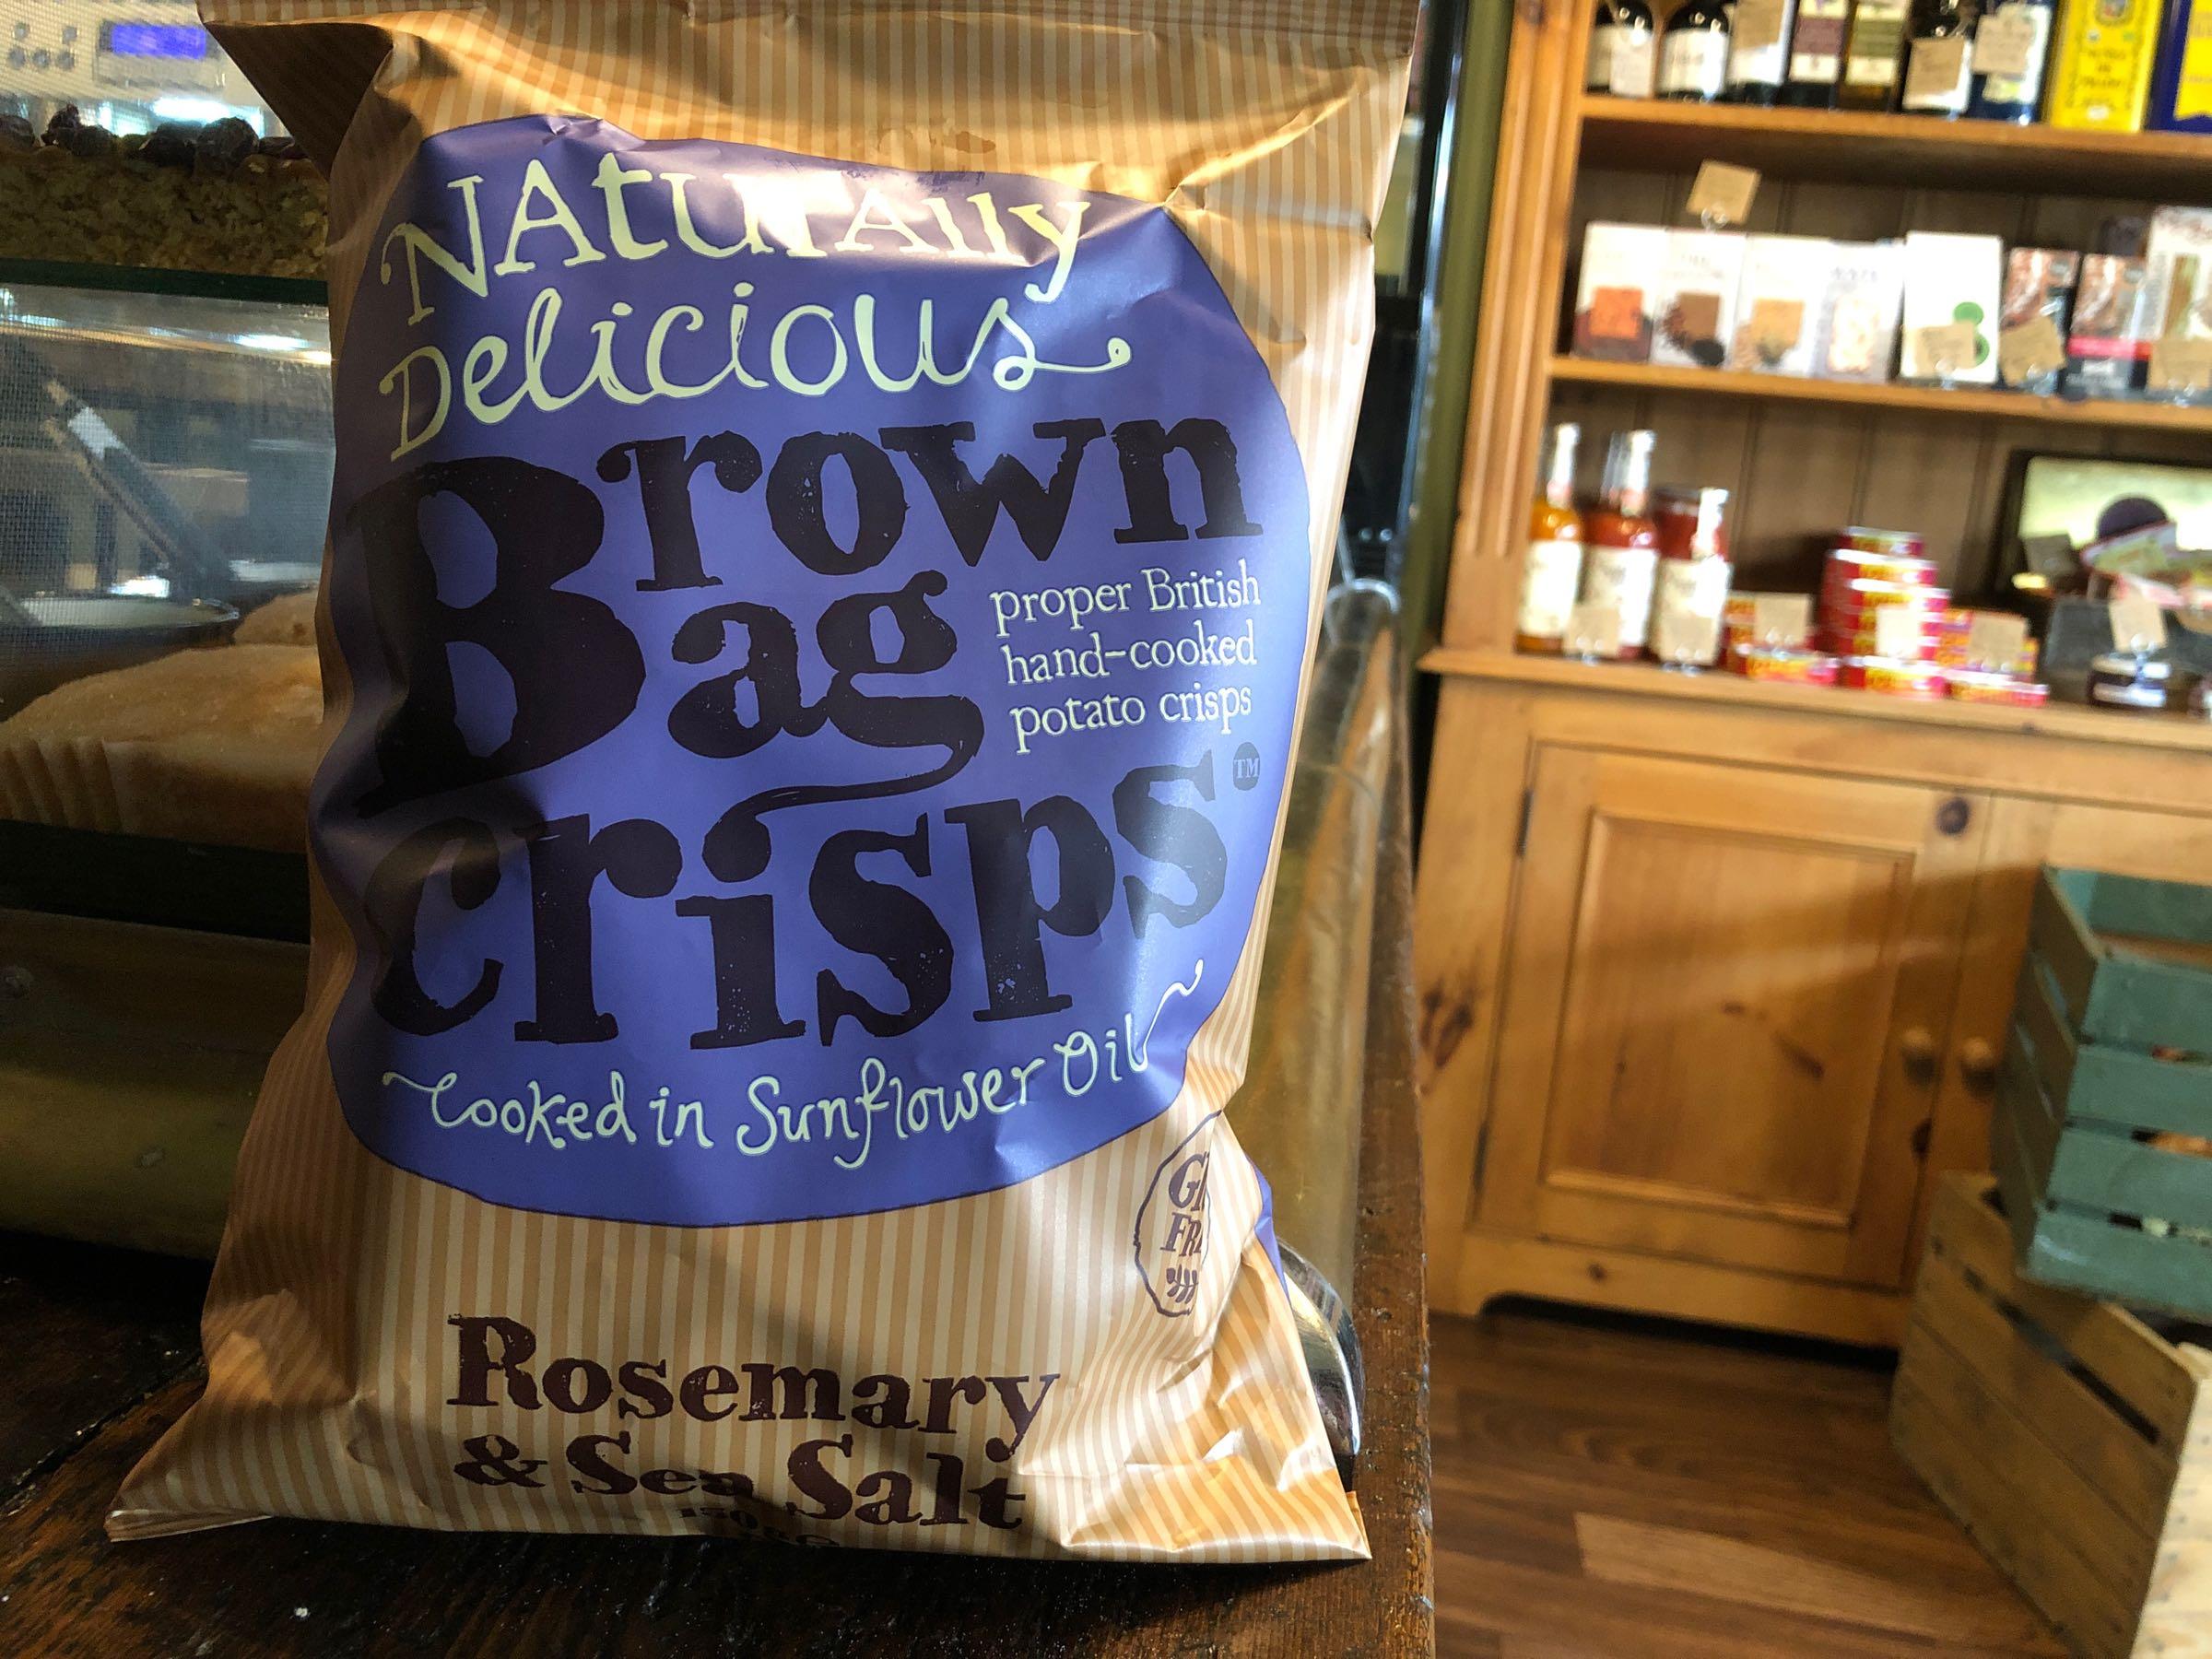 Brown Bag Crisps Rosemary and Sea Salt 150g